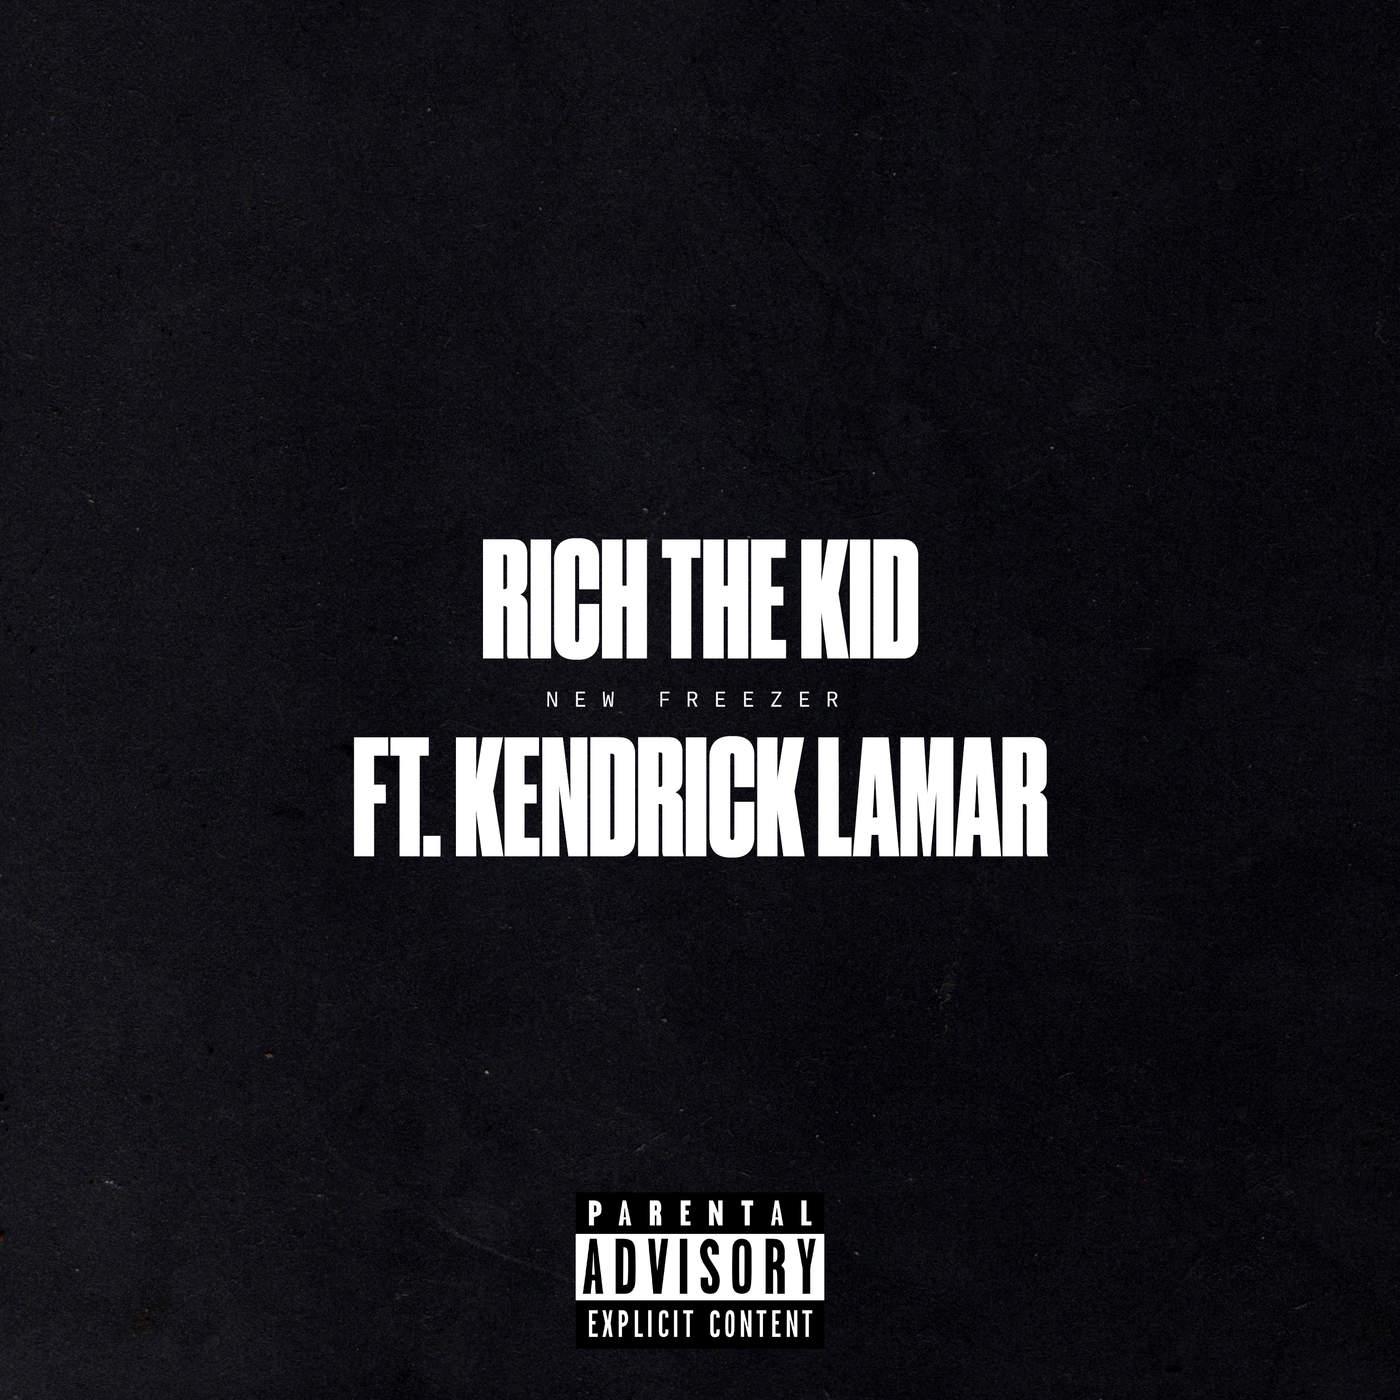 Rich The Kid Ft. Kendrick Lamar - New Freezer itunes